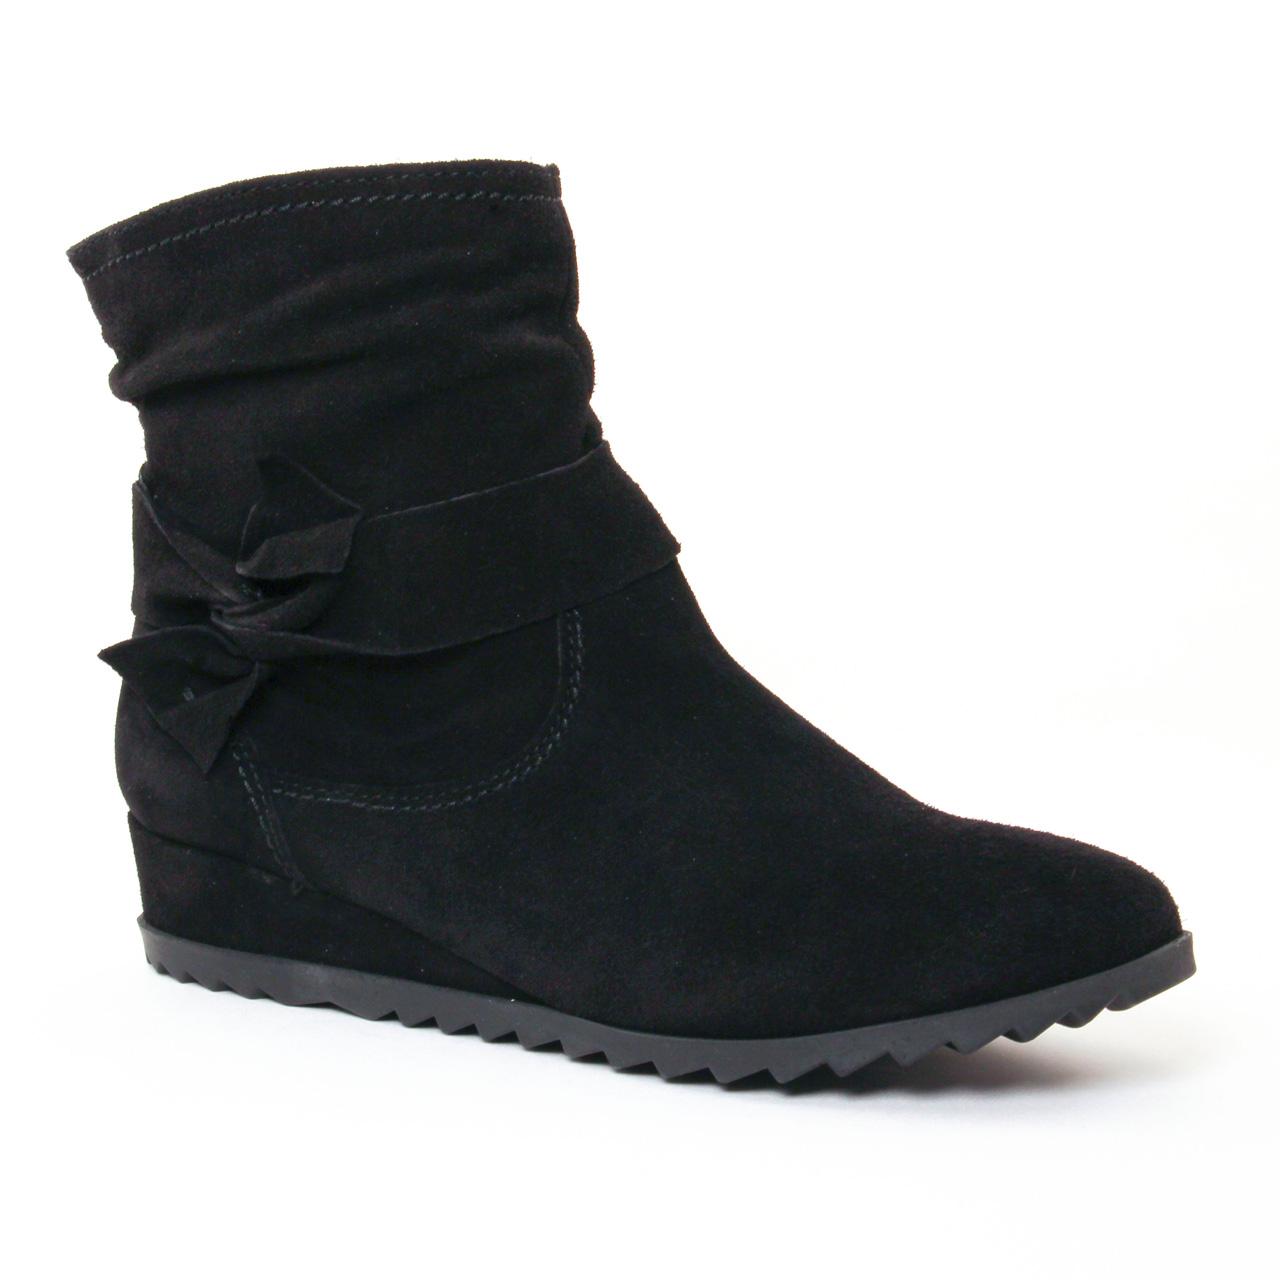 tamaris chaussures boots. Black Bedroom Furniture Sets. Home Design Ideas